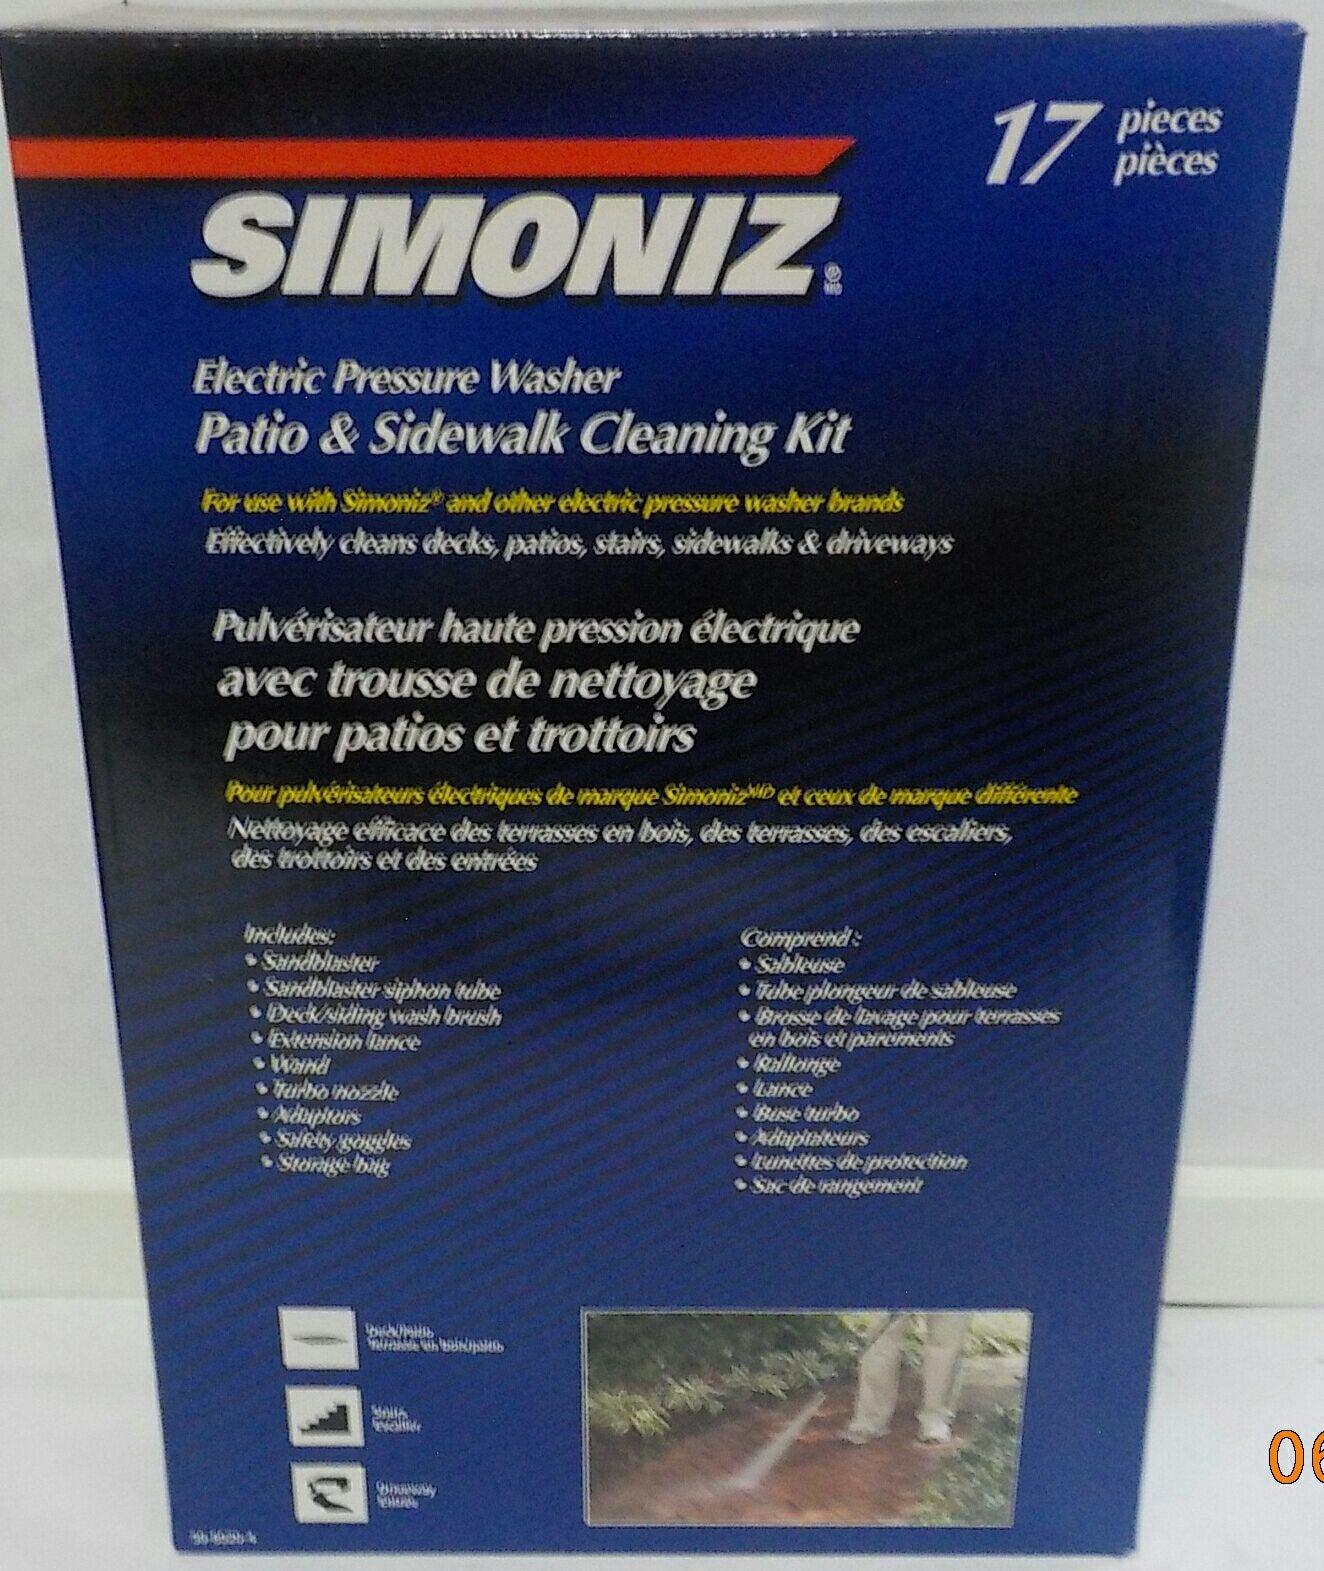 Simoniz Electric Pressure Washer Kit